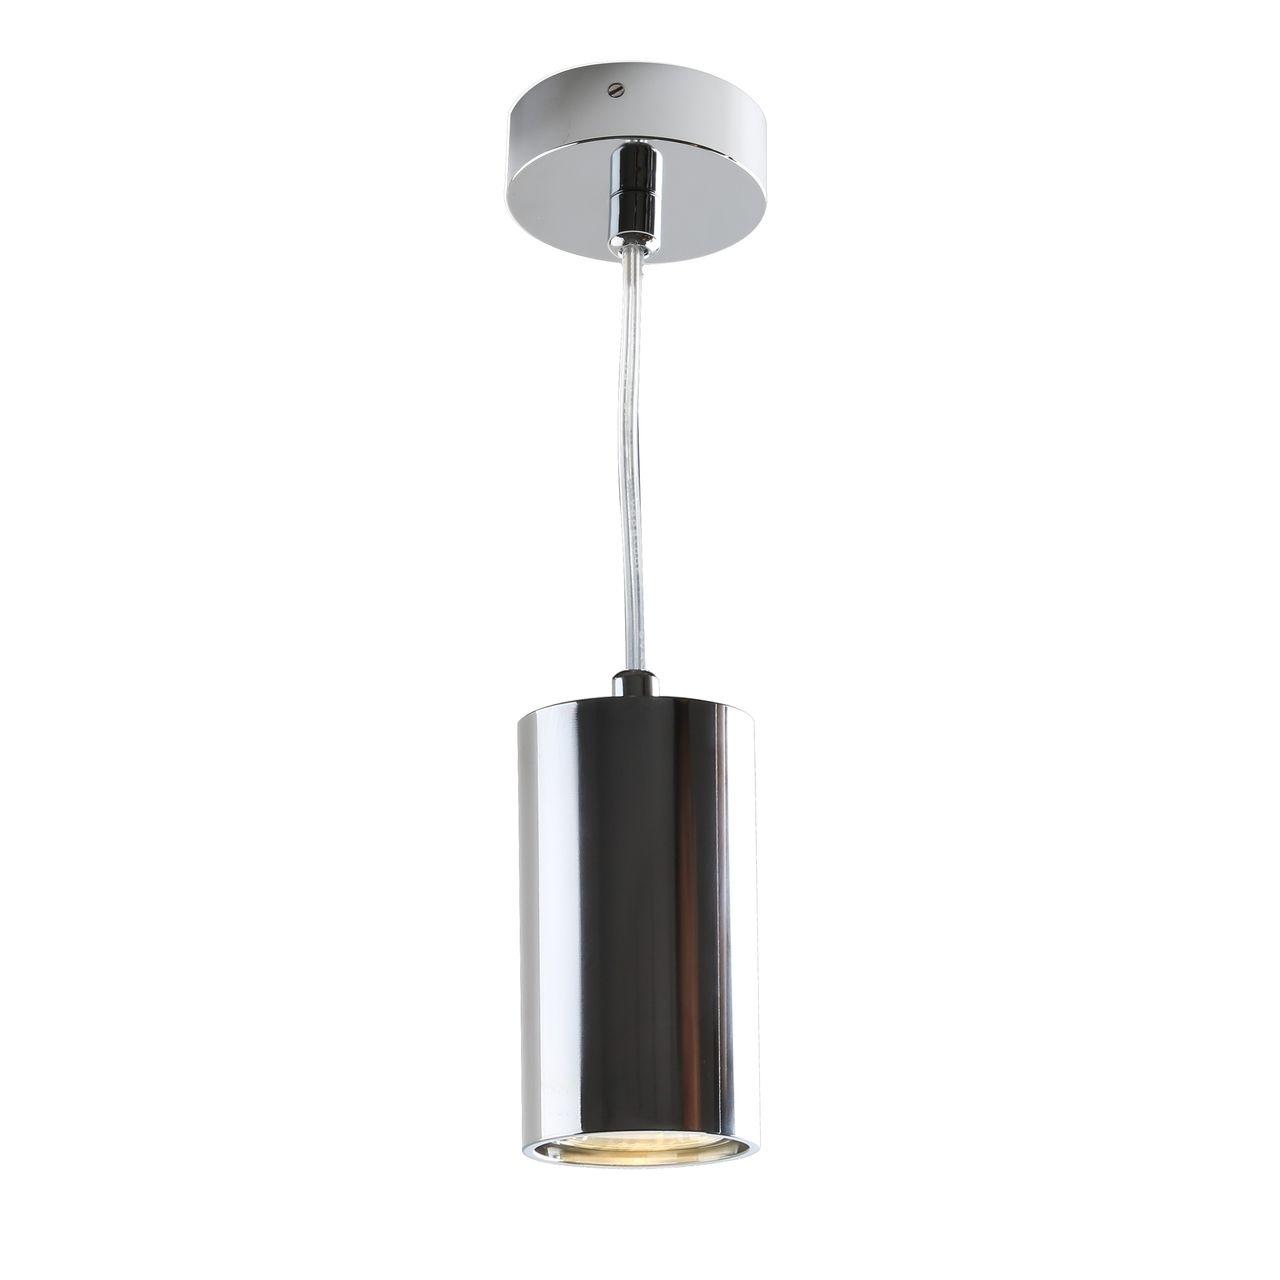 1359/02 SP-1 Подвесной светильник Divinare Gavroche Sotto